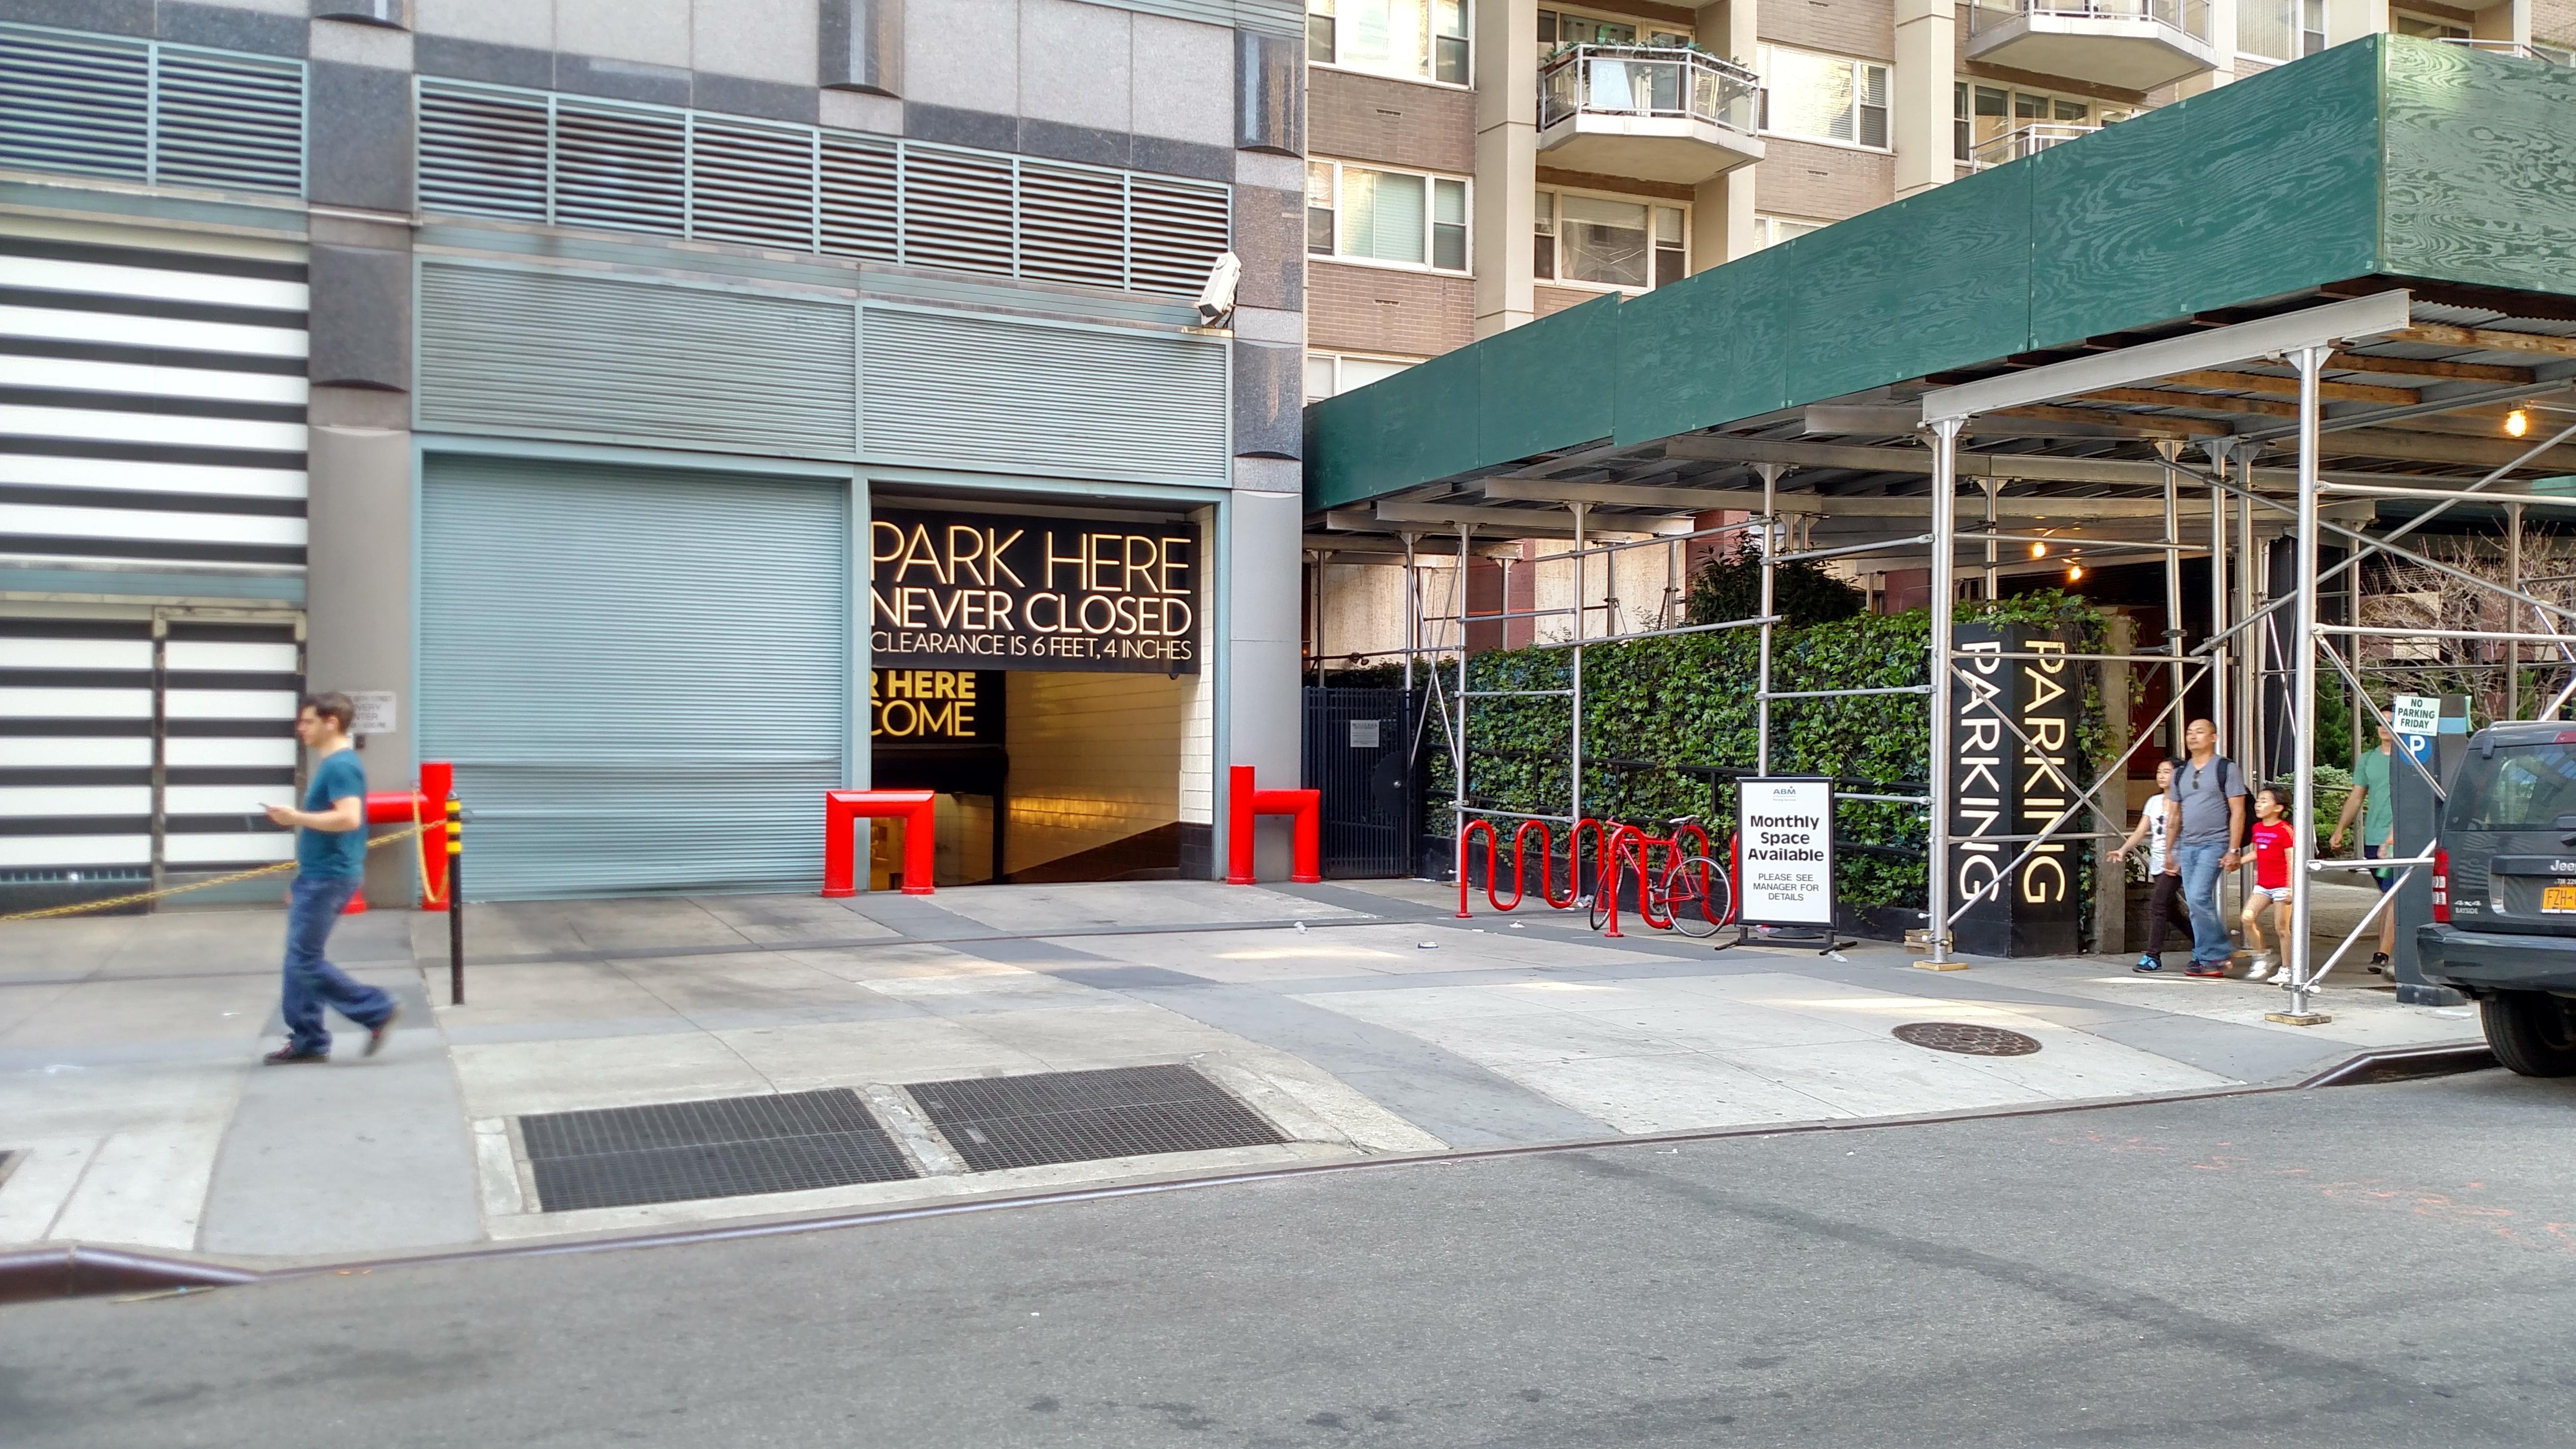 750 lexington ave garage parking in new york parkme for New york parking garage